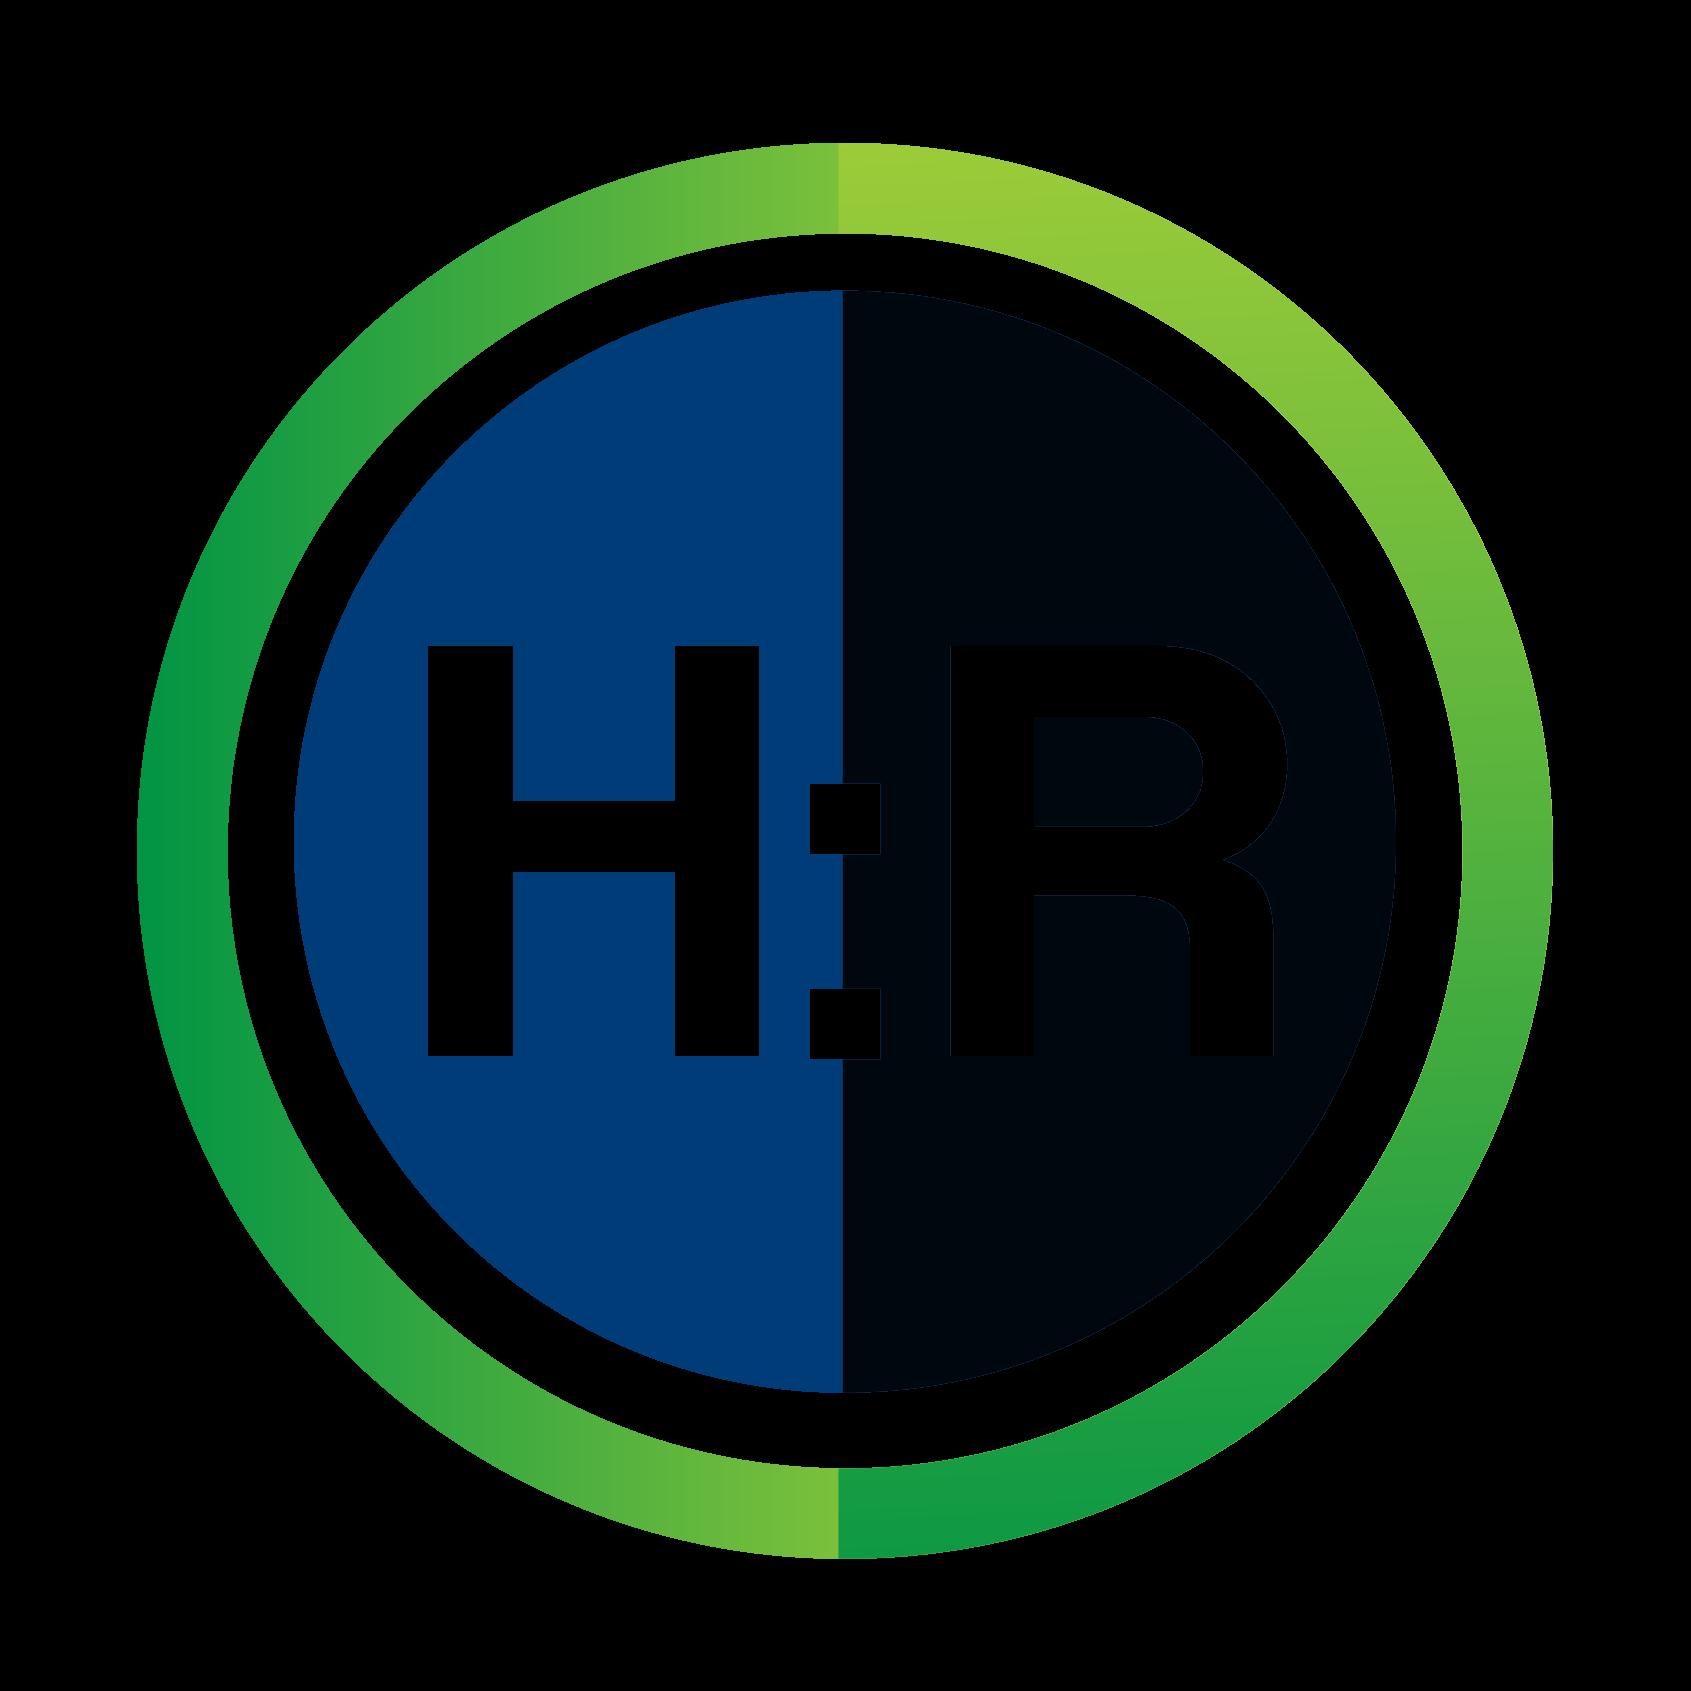 @healthbyratio Profile Image | Linktree